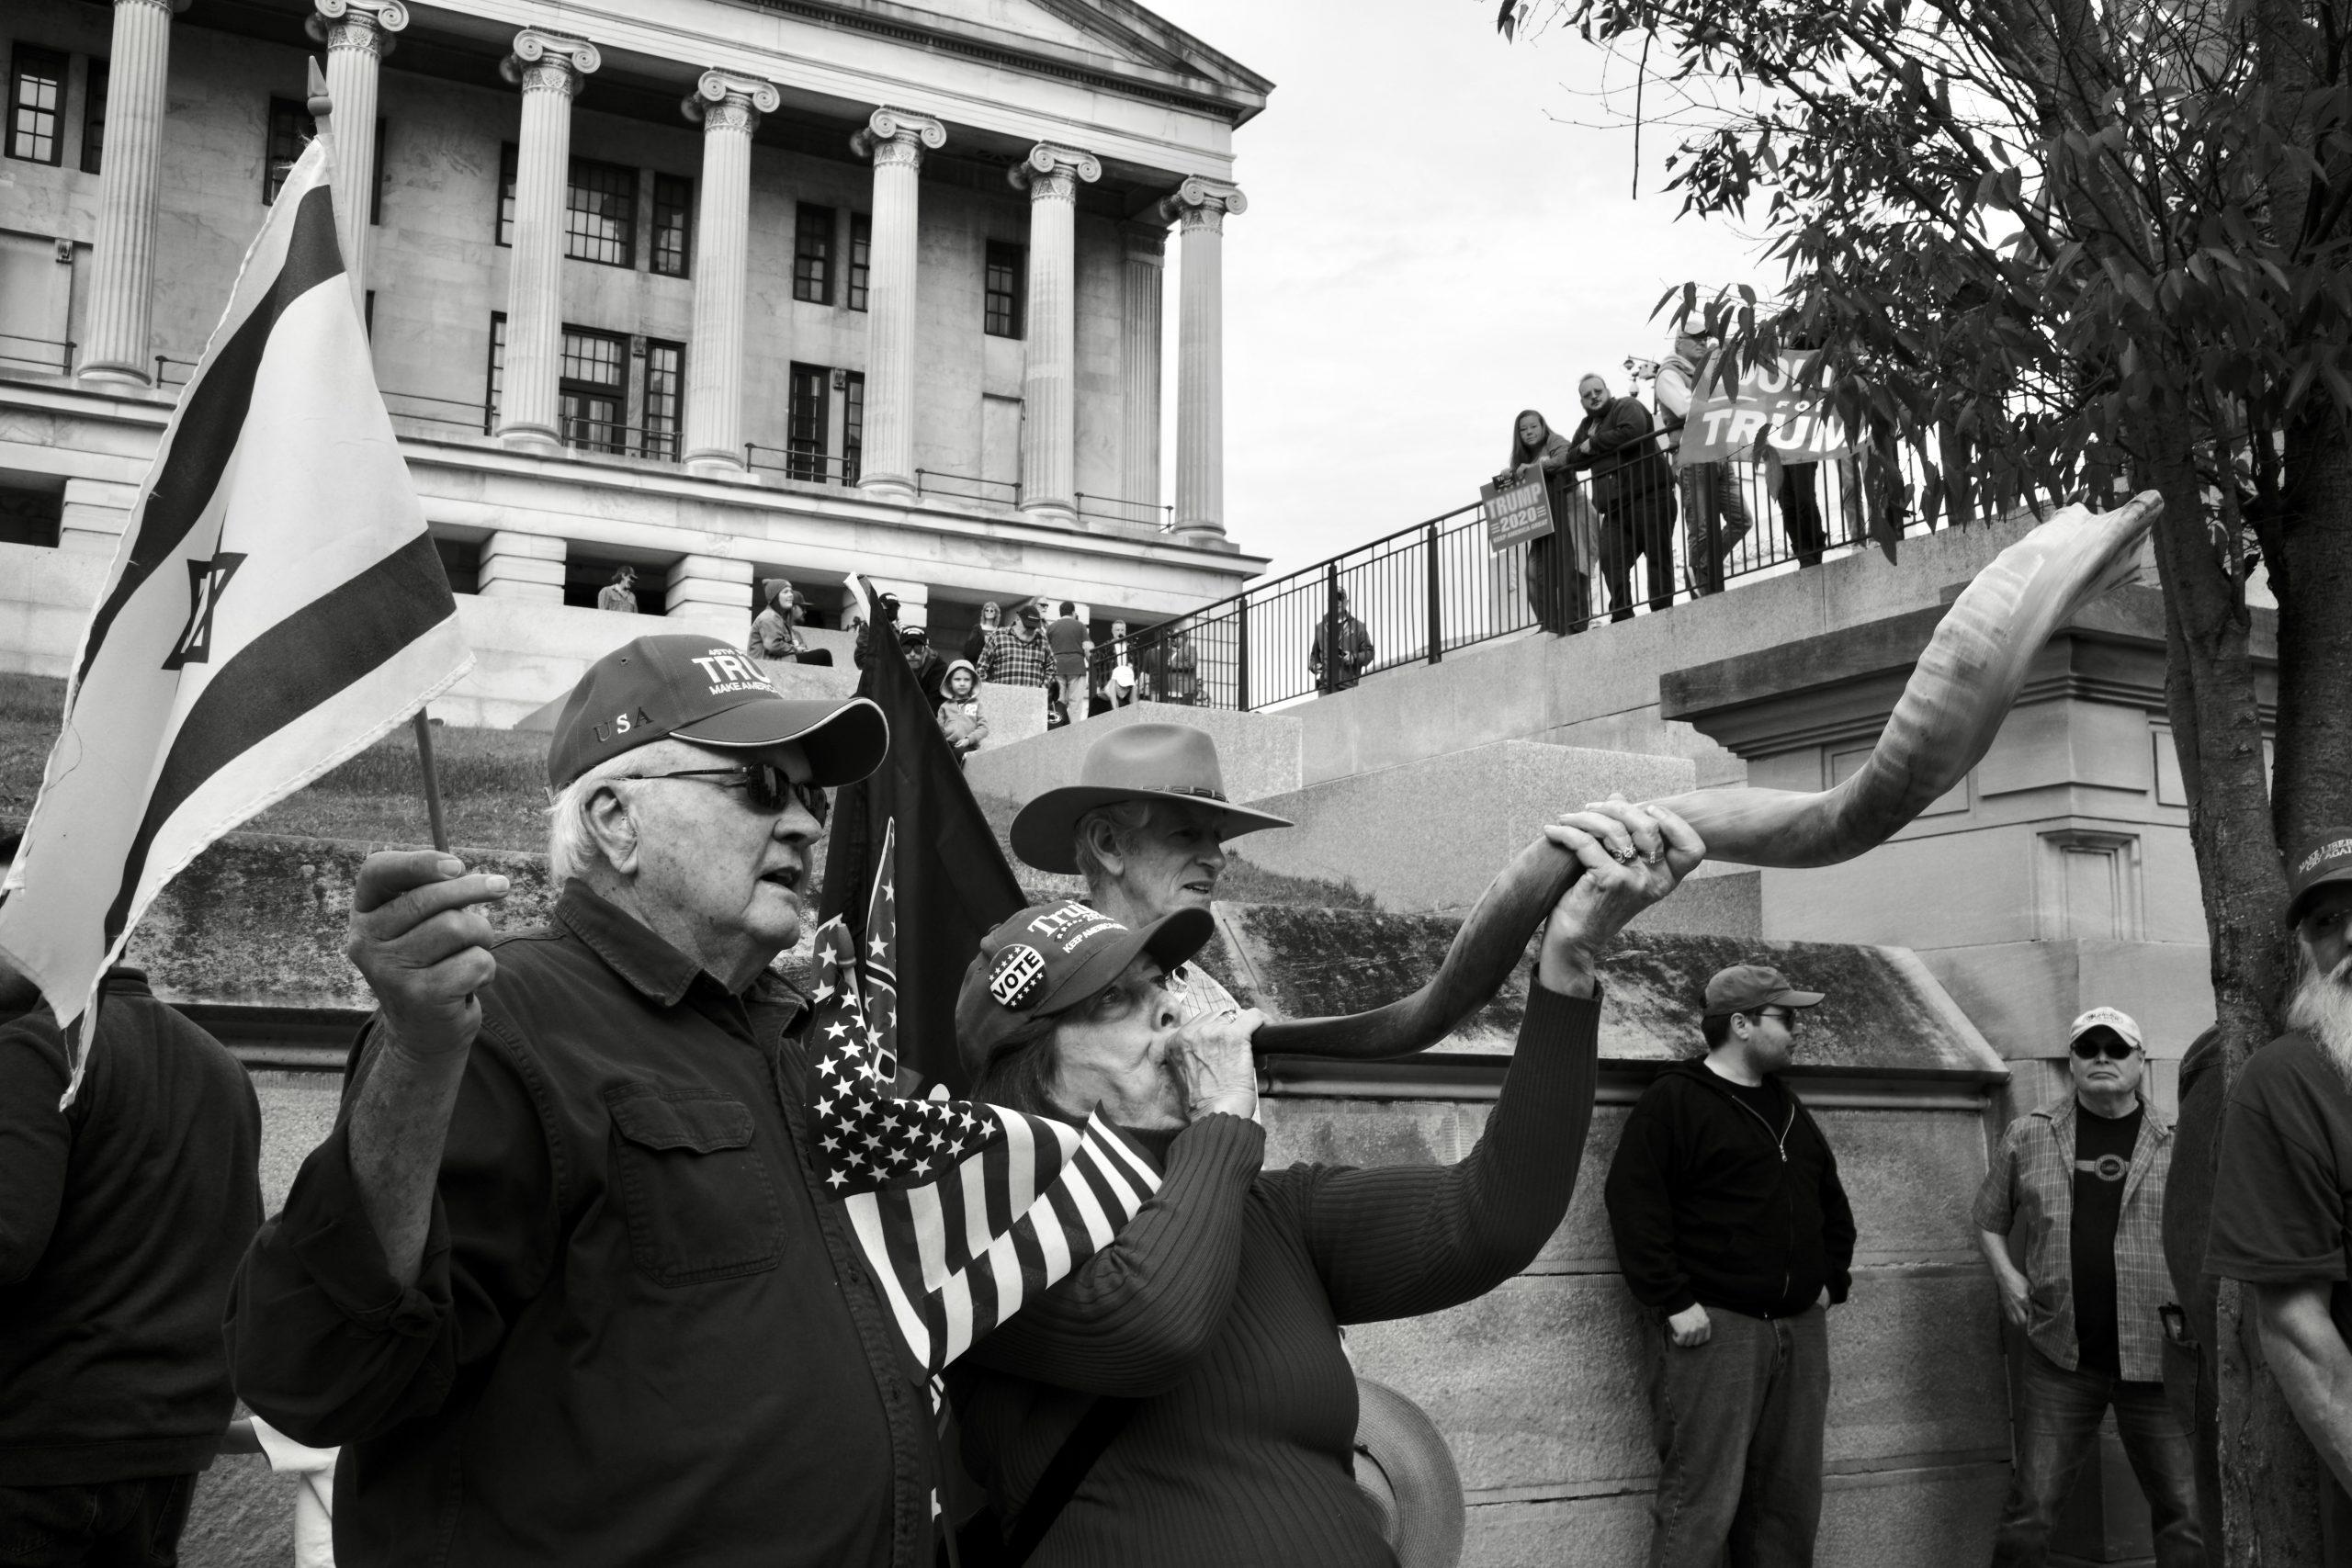 A woman blows a vuvuzela at Saturday's protest. (Photo: Ray Di Pietro)